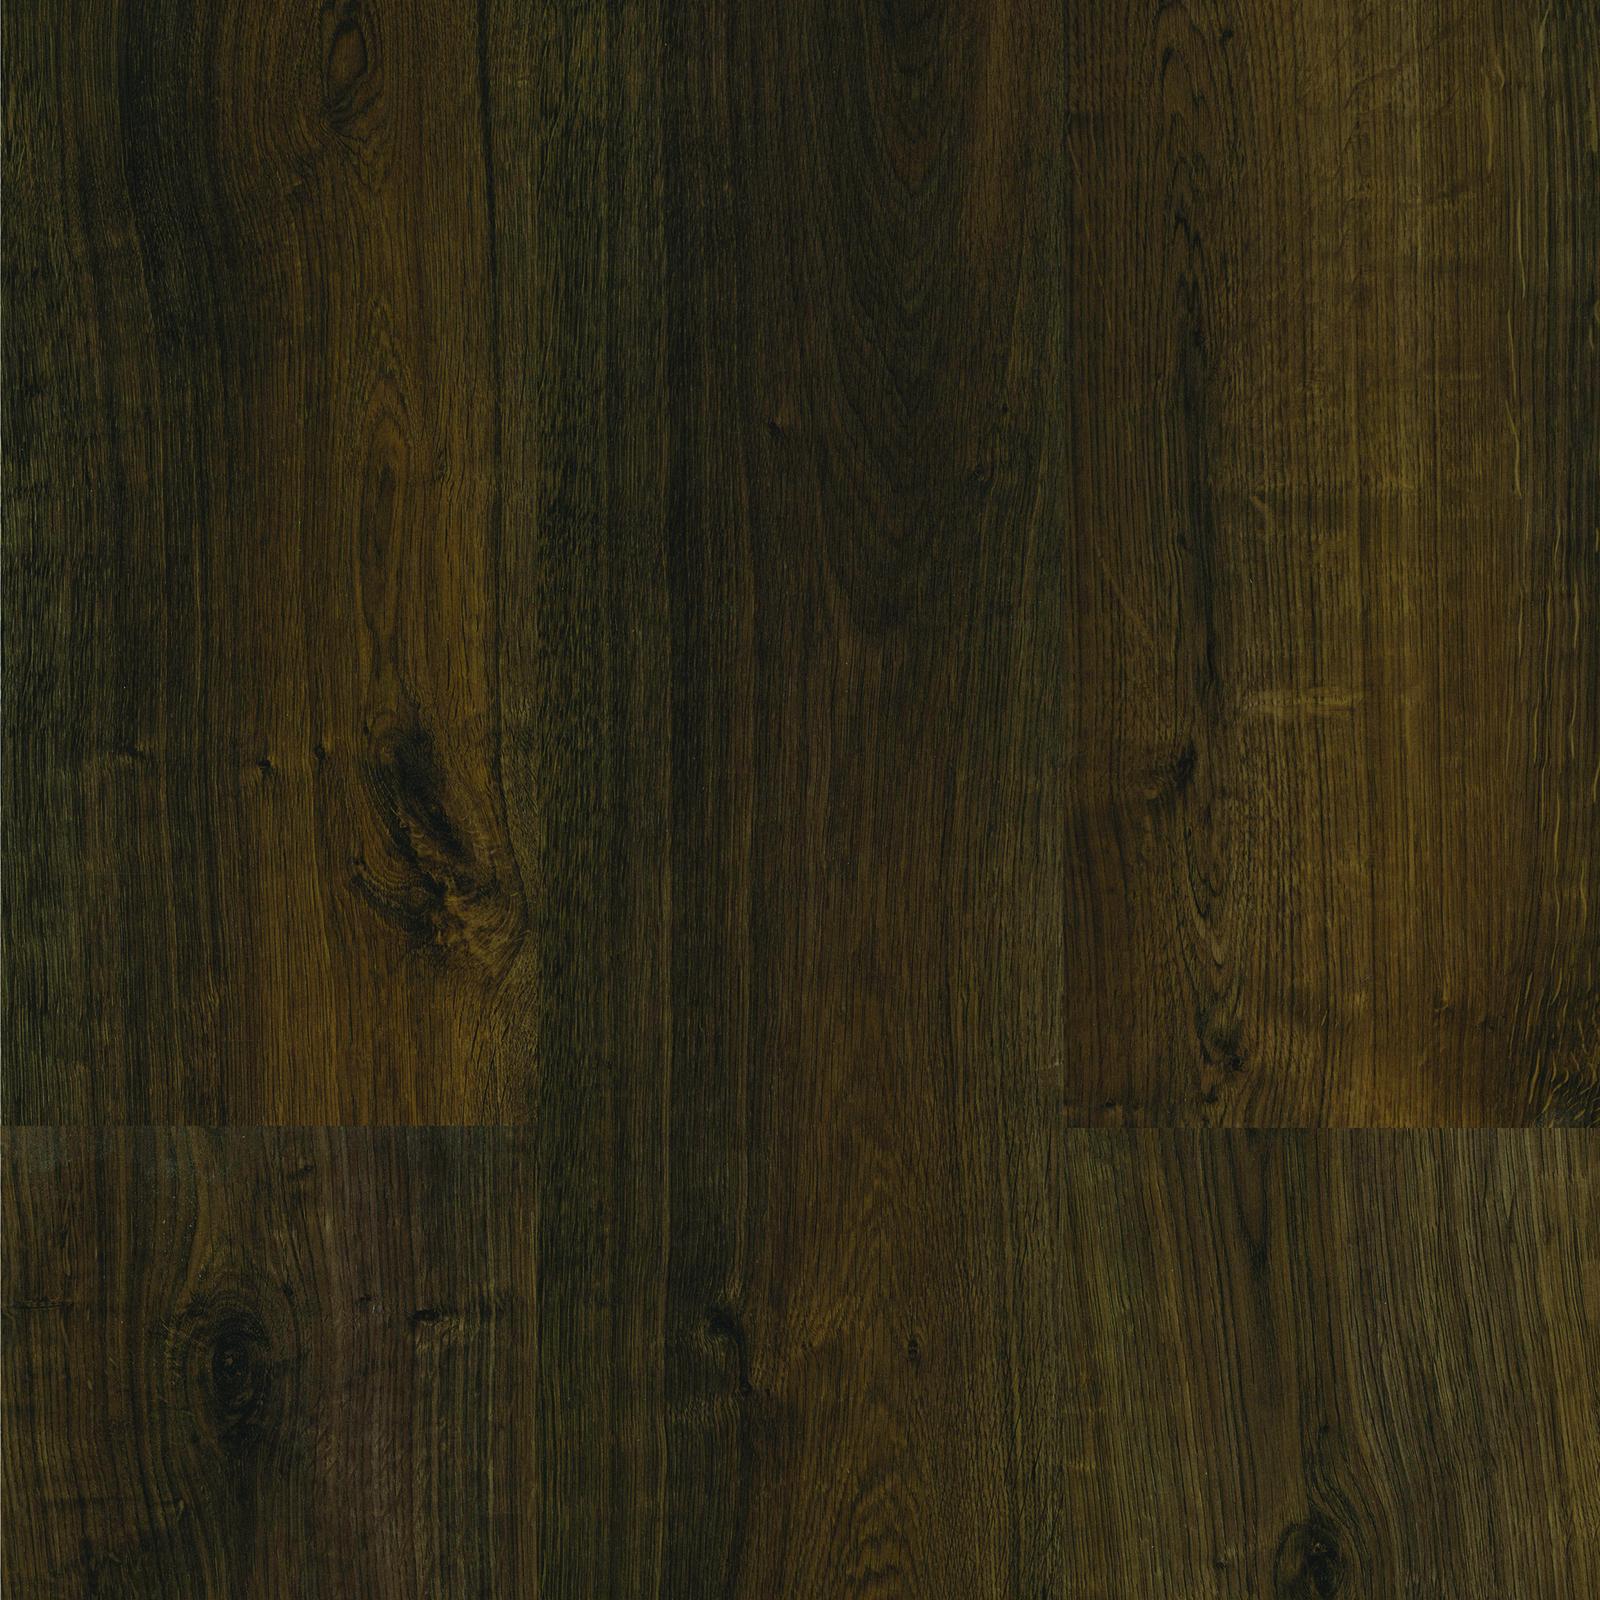 Brushed, Rodos Oak (4356)